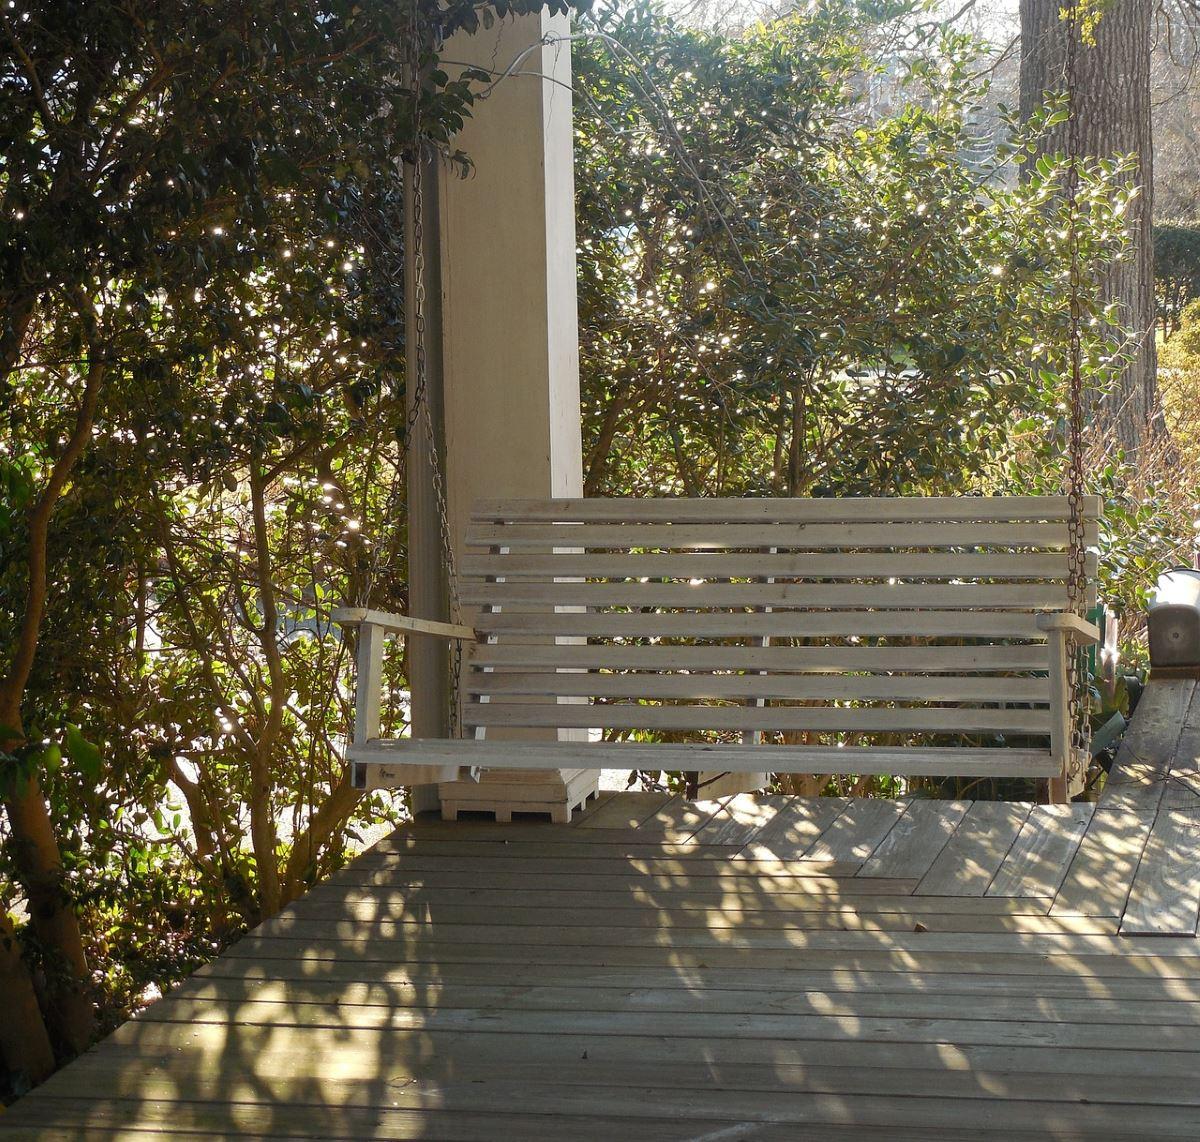 Best 20 Cedar Porch Swings | Salt Lamp City Inside 3 Person Natural Cedar Wood Outdoor Swings (Image 6 of 25)